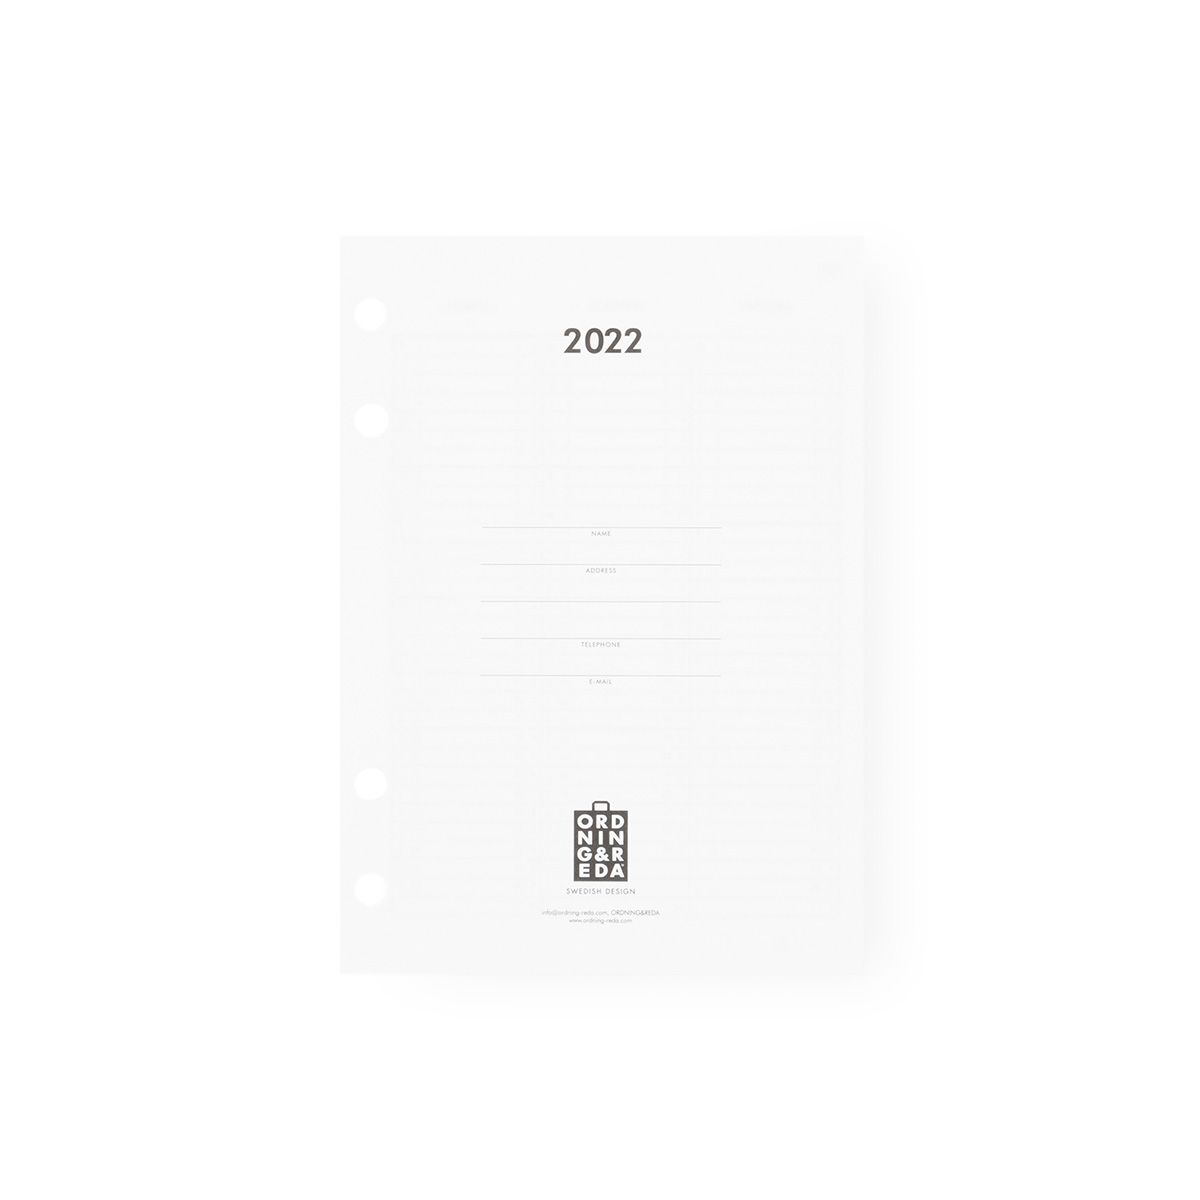 Diary 2022 INSERT Ordning and Reda